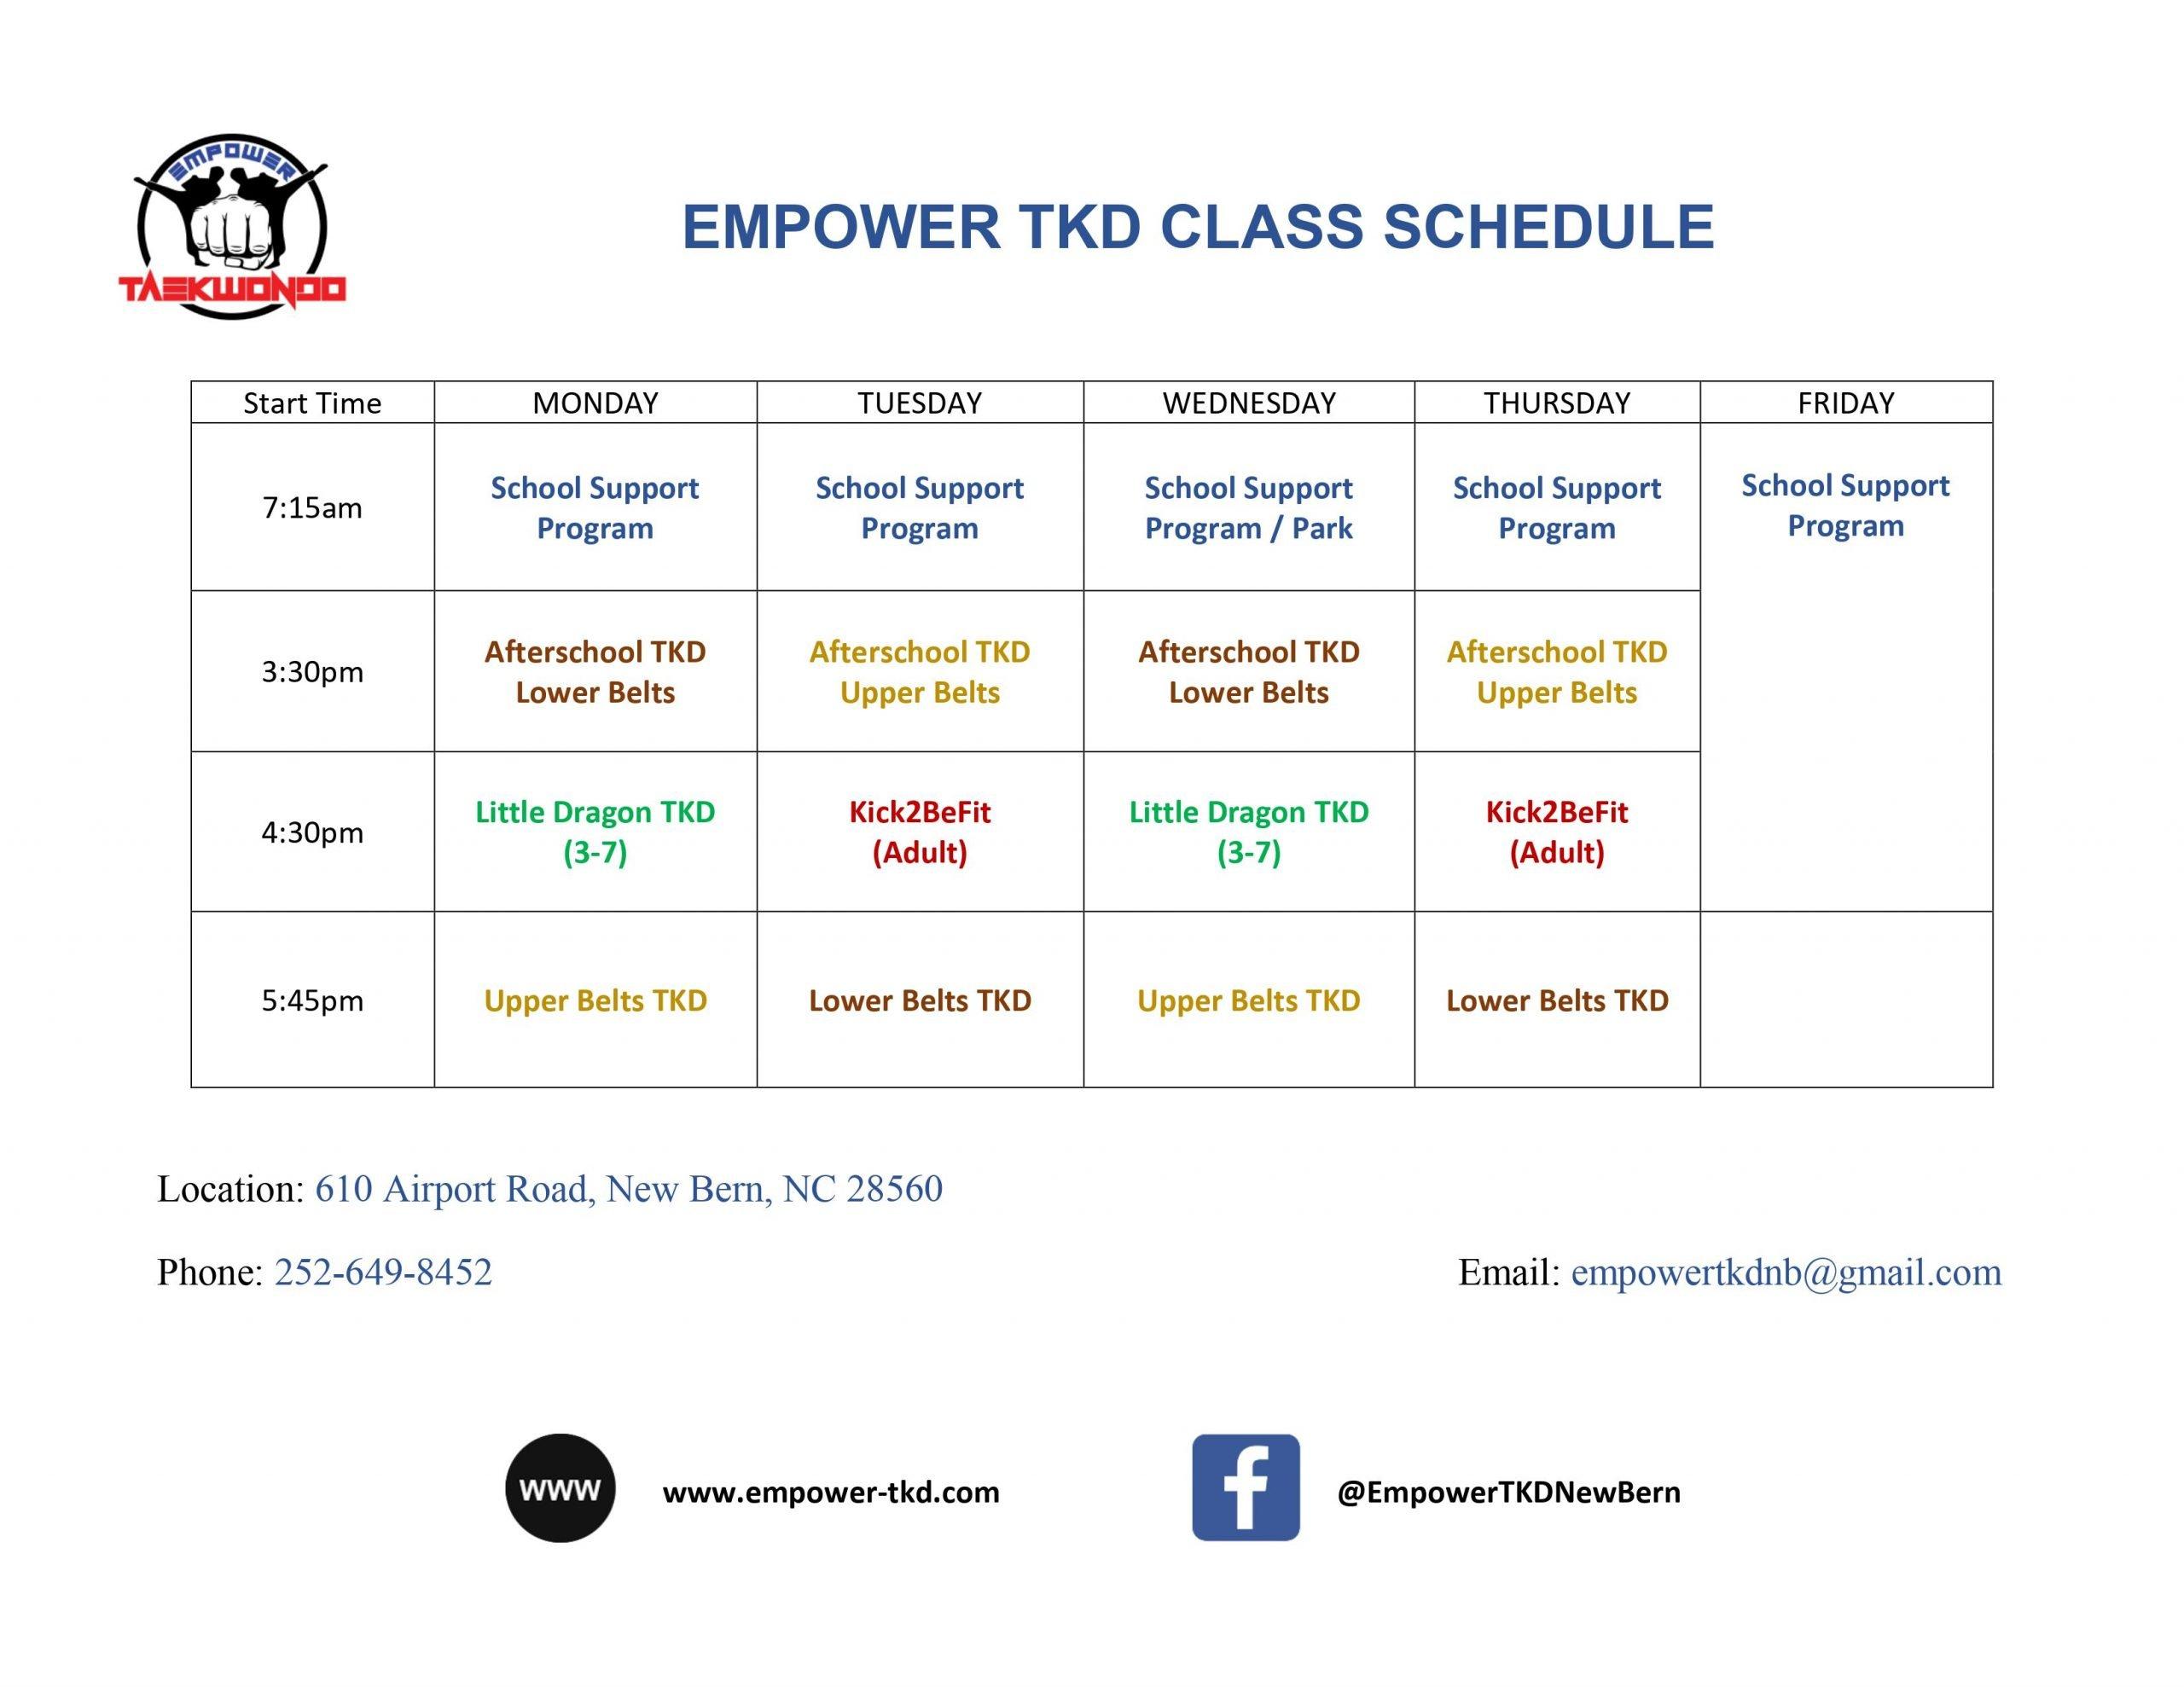 Empower TKD Evening Classes Schedule 202101